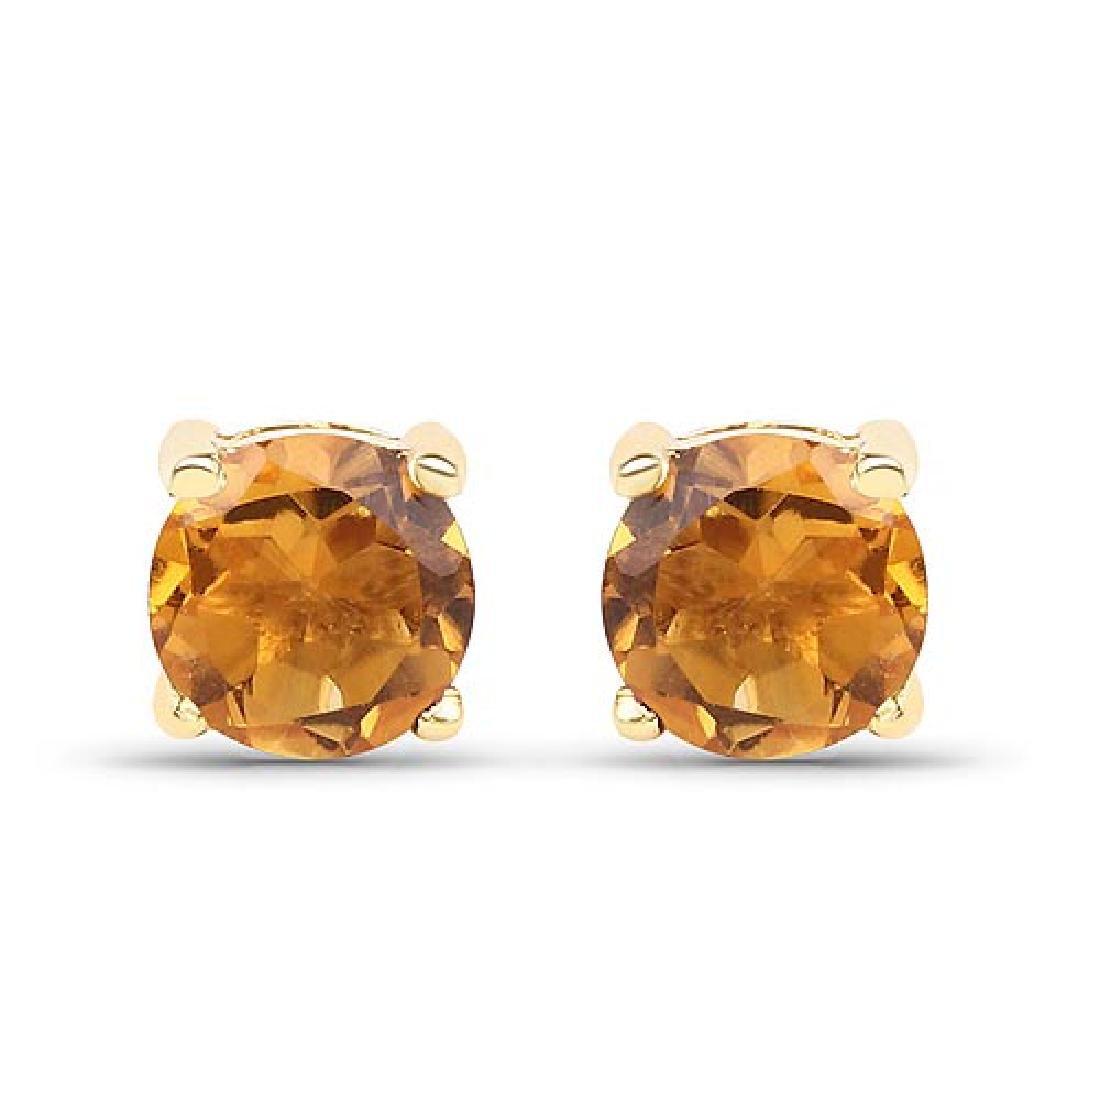 0.46 Carat Genuine Citrine 10K Yellow Gold Earrings